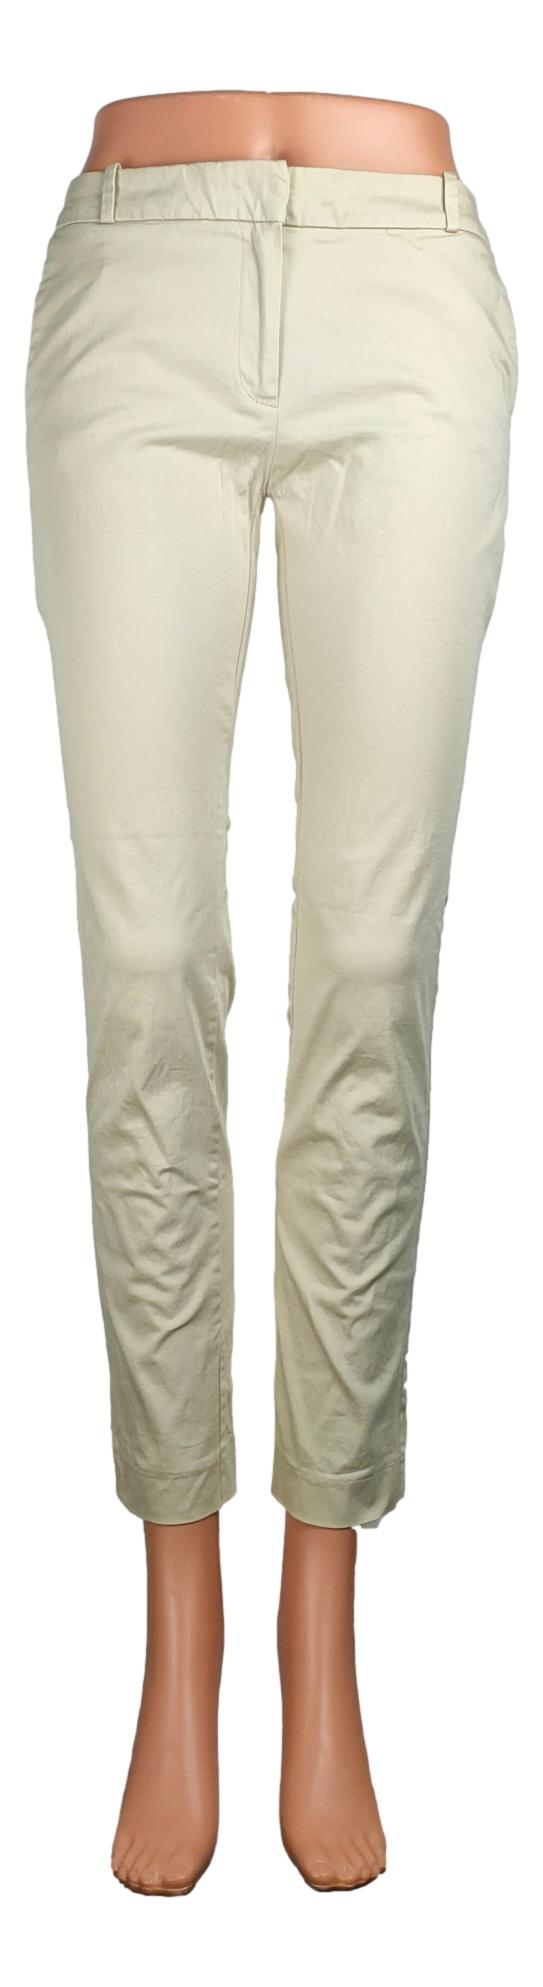 Pantalon Promod - taille 36